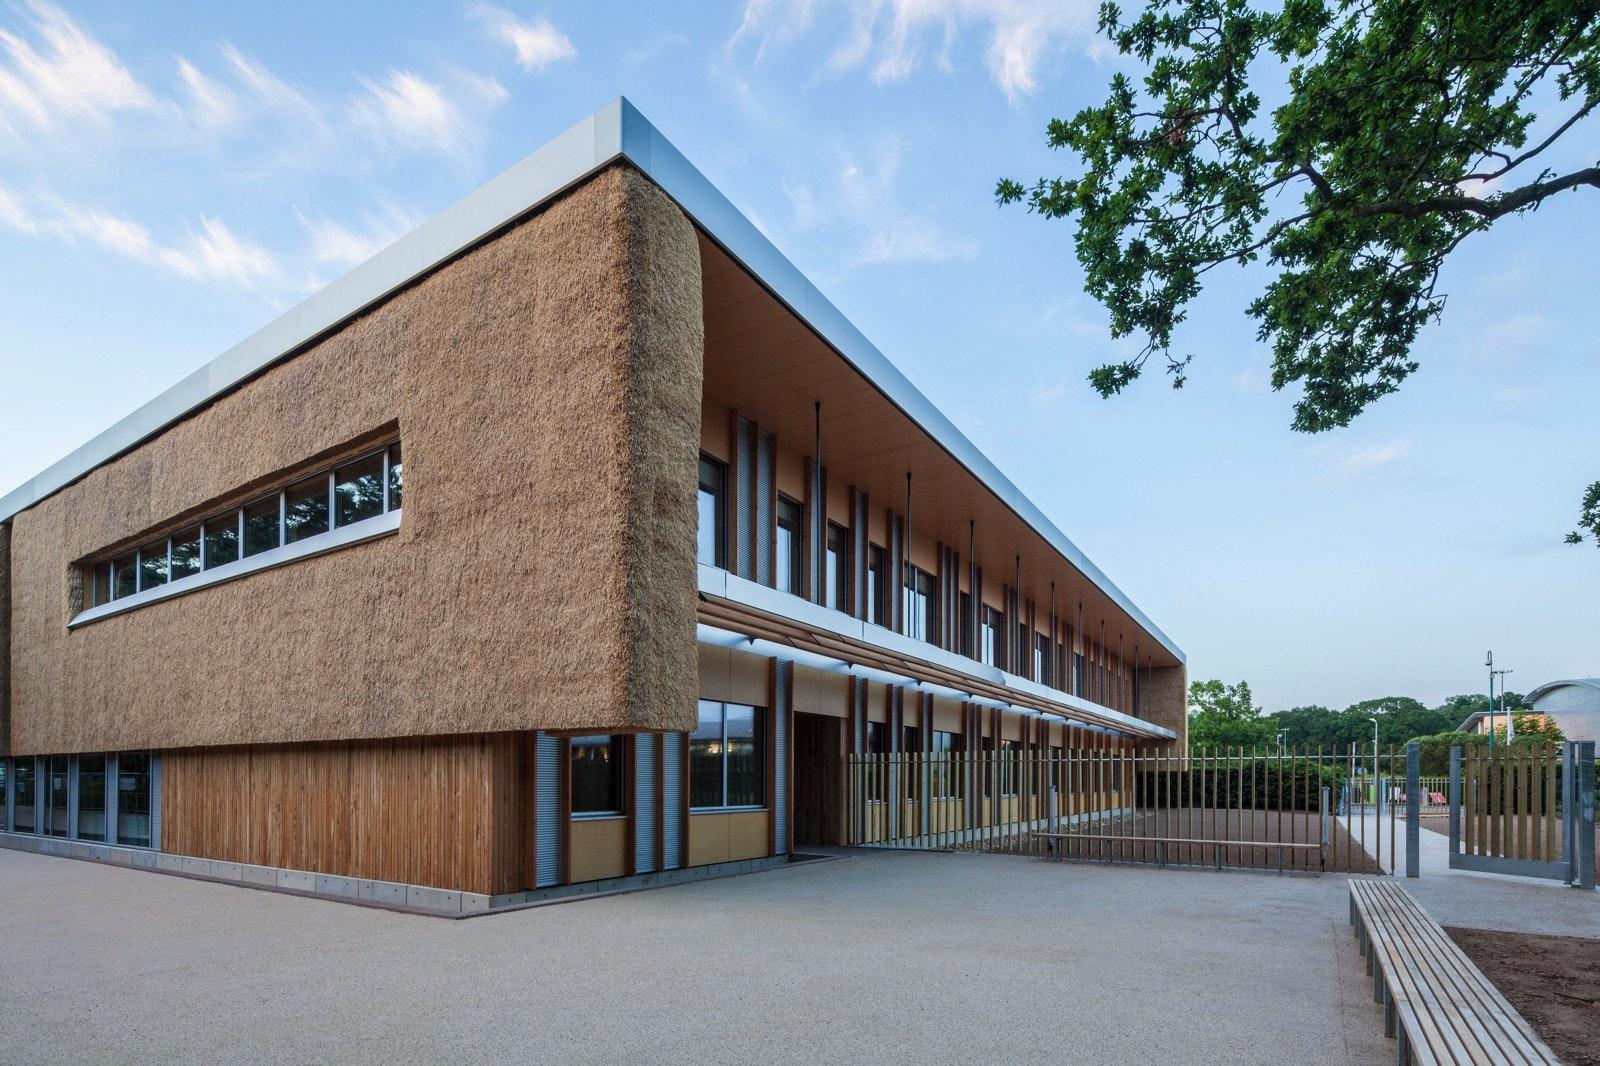 The Enterprise Centre, Norwich, UK, by BDP. Photo: Dennis Gilbert.